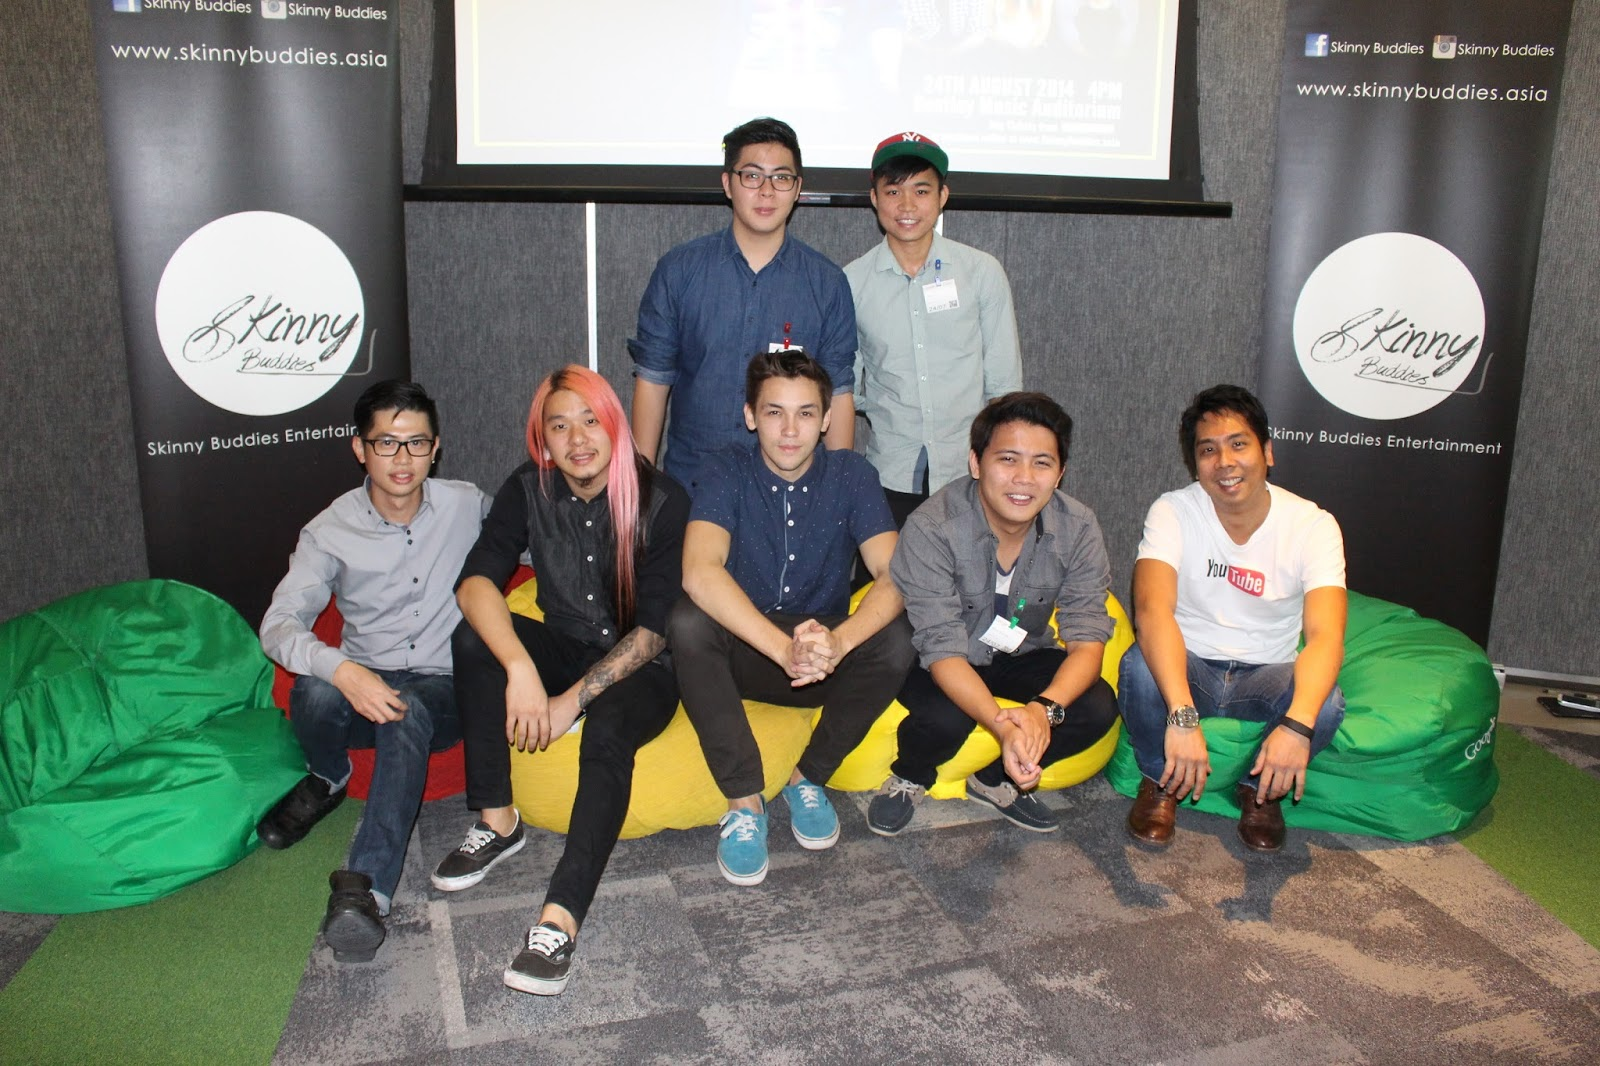 The panel photo shows (Bottom Row L-R) Leonard Chua (Skinny Buddies Entertainment), Darren Teh (An Honest Mistake), Mark O'dea (Host), Ming Han (Skyward), Zeffri Yusof (Google Malaysia). (Back Row) Skyward band members.